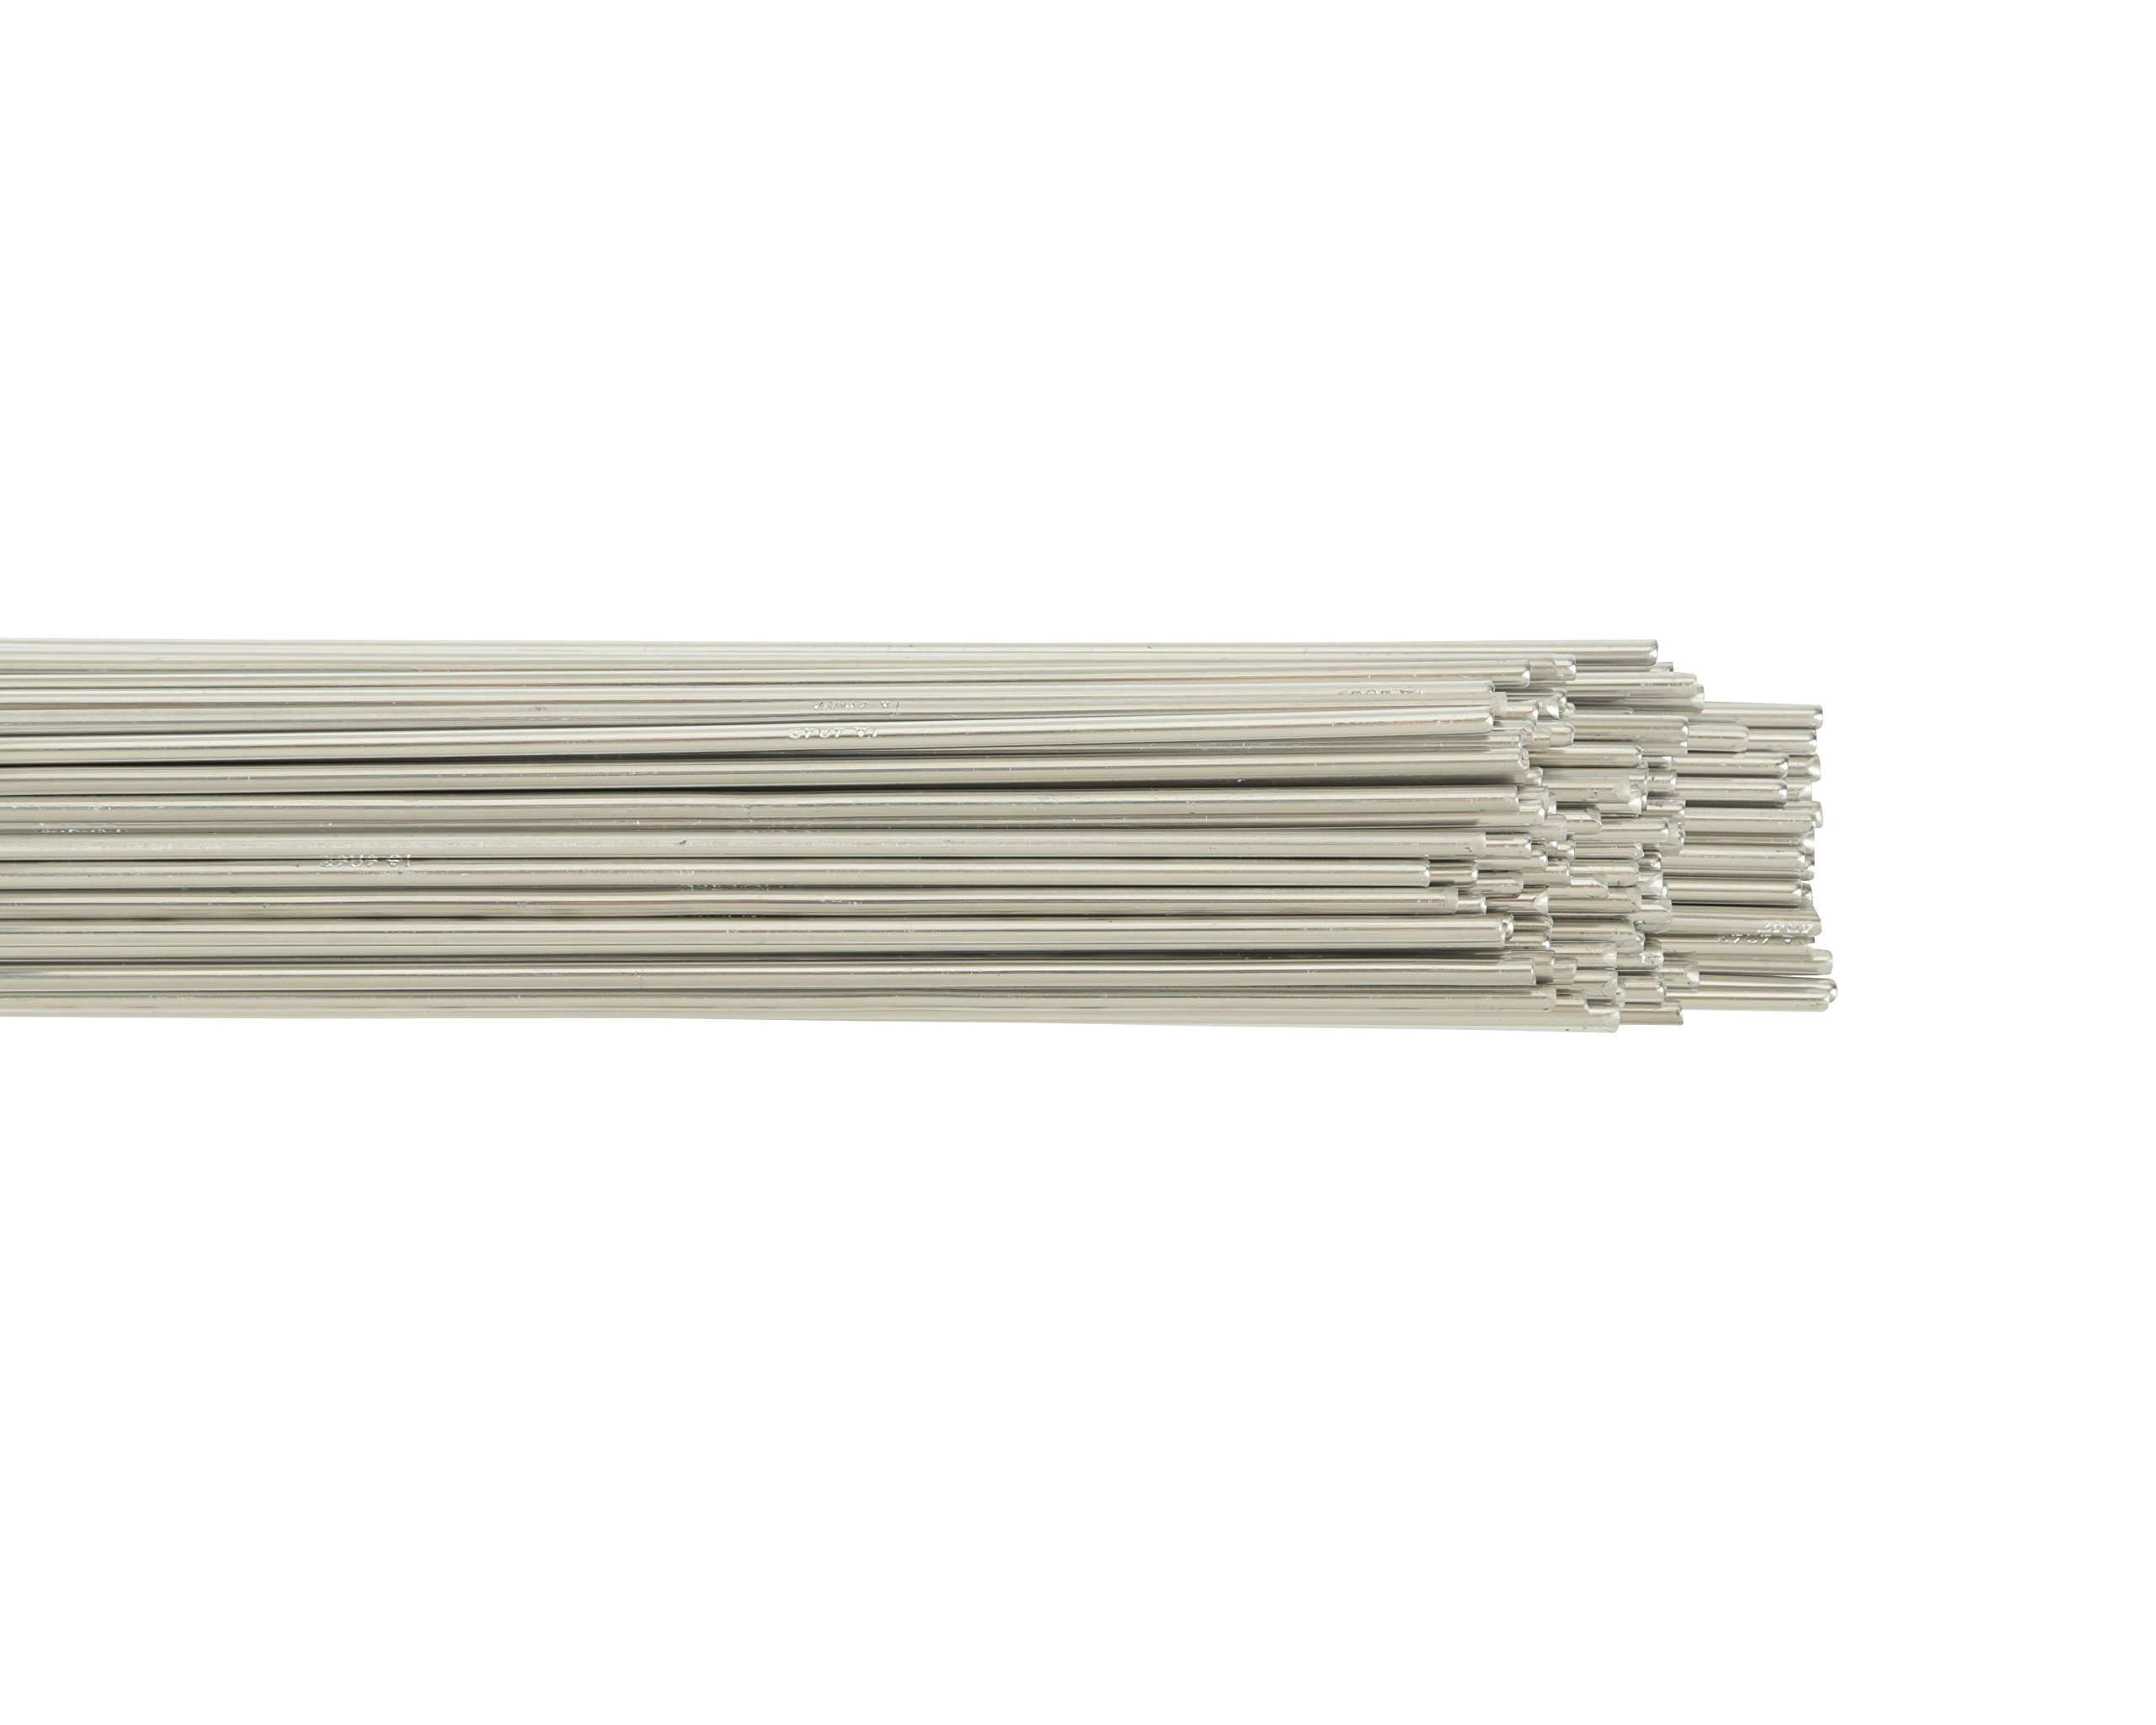 Harris 0404380 4043 Aluminum TIG Welding Rod, 3/16'' x 36'' x 10 lb. Box